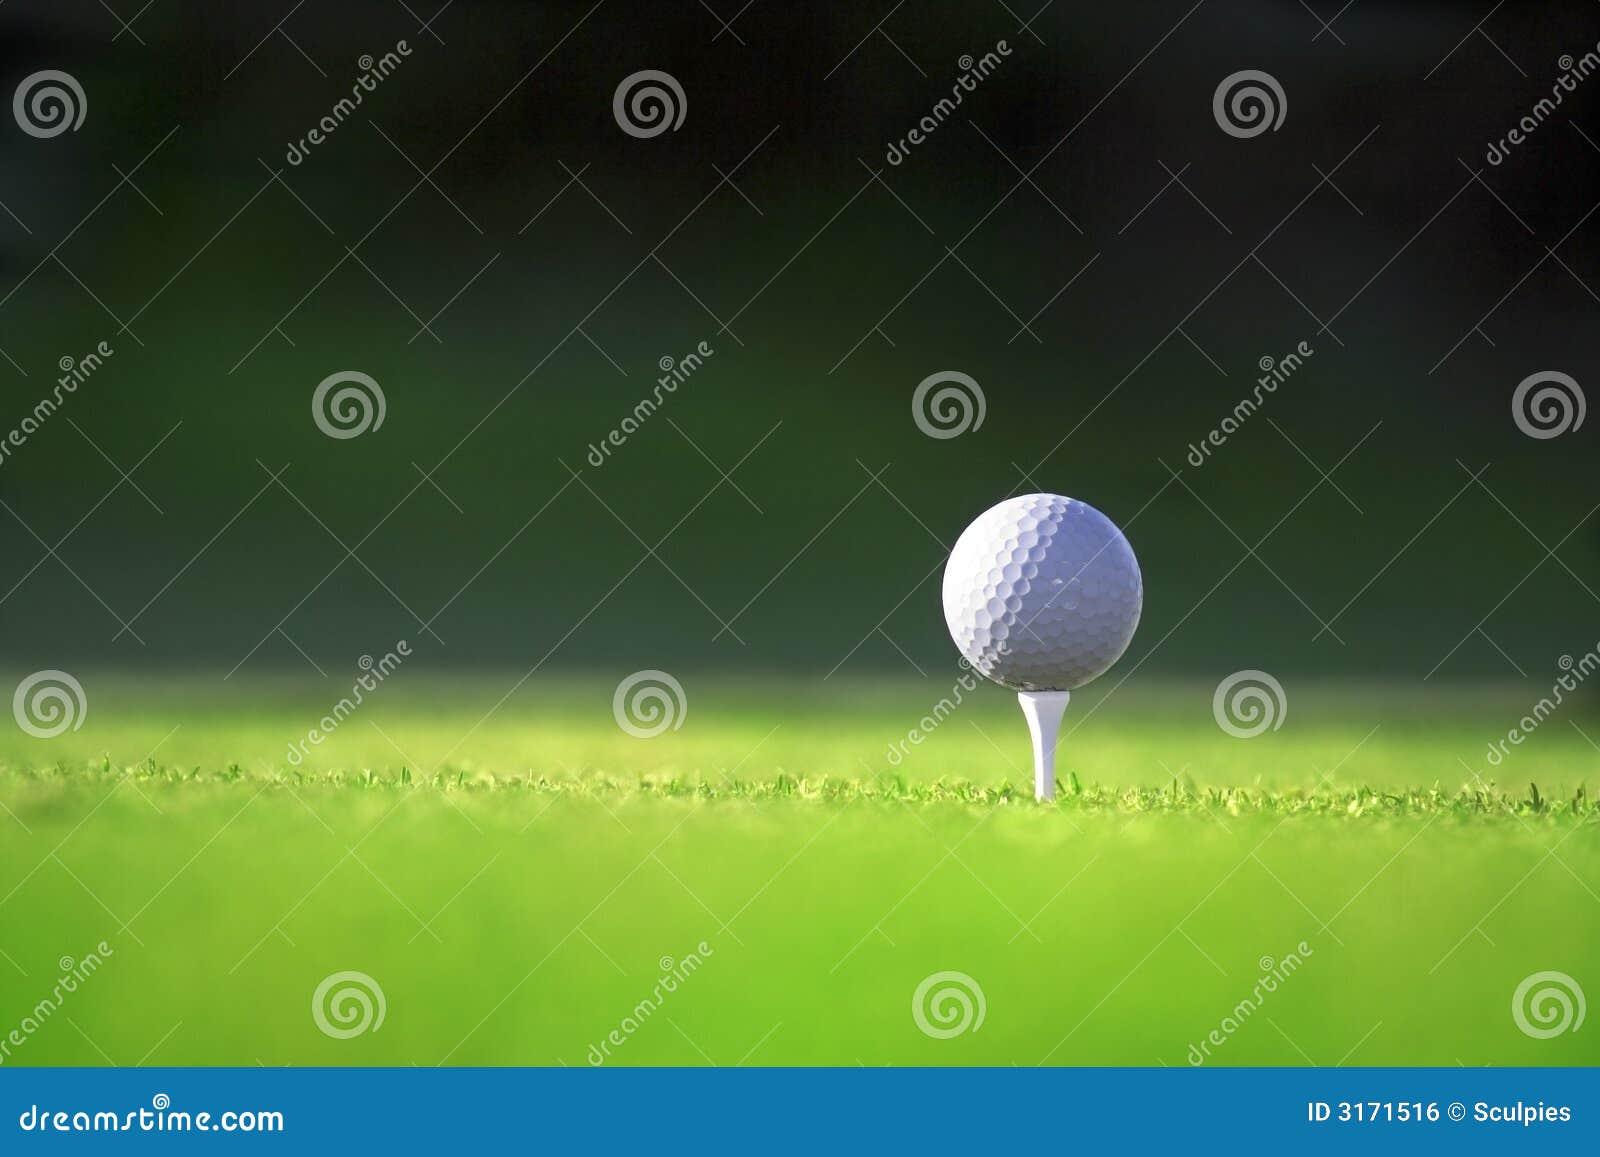 Golfball Royalty Free Stock Image - Image: 3171516